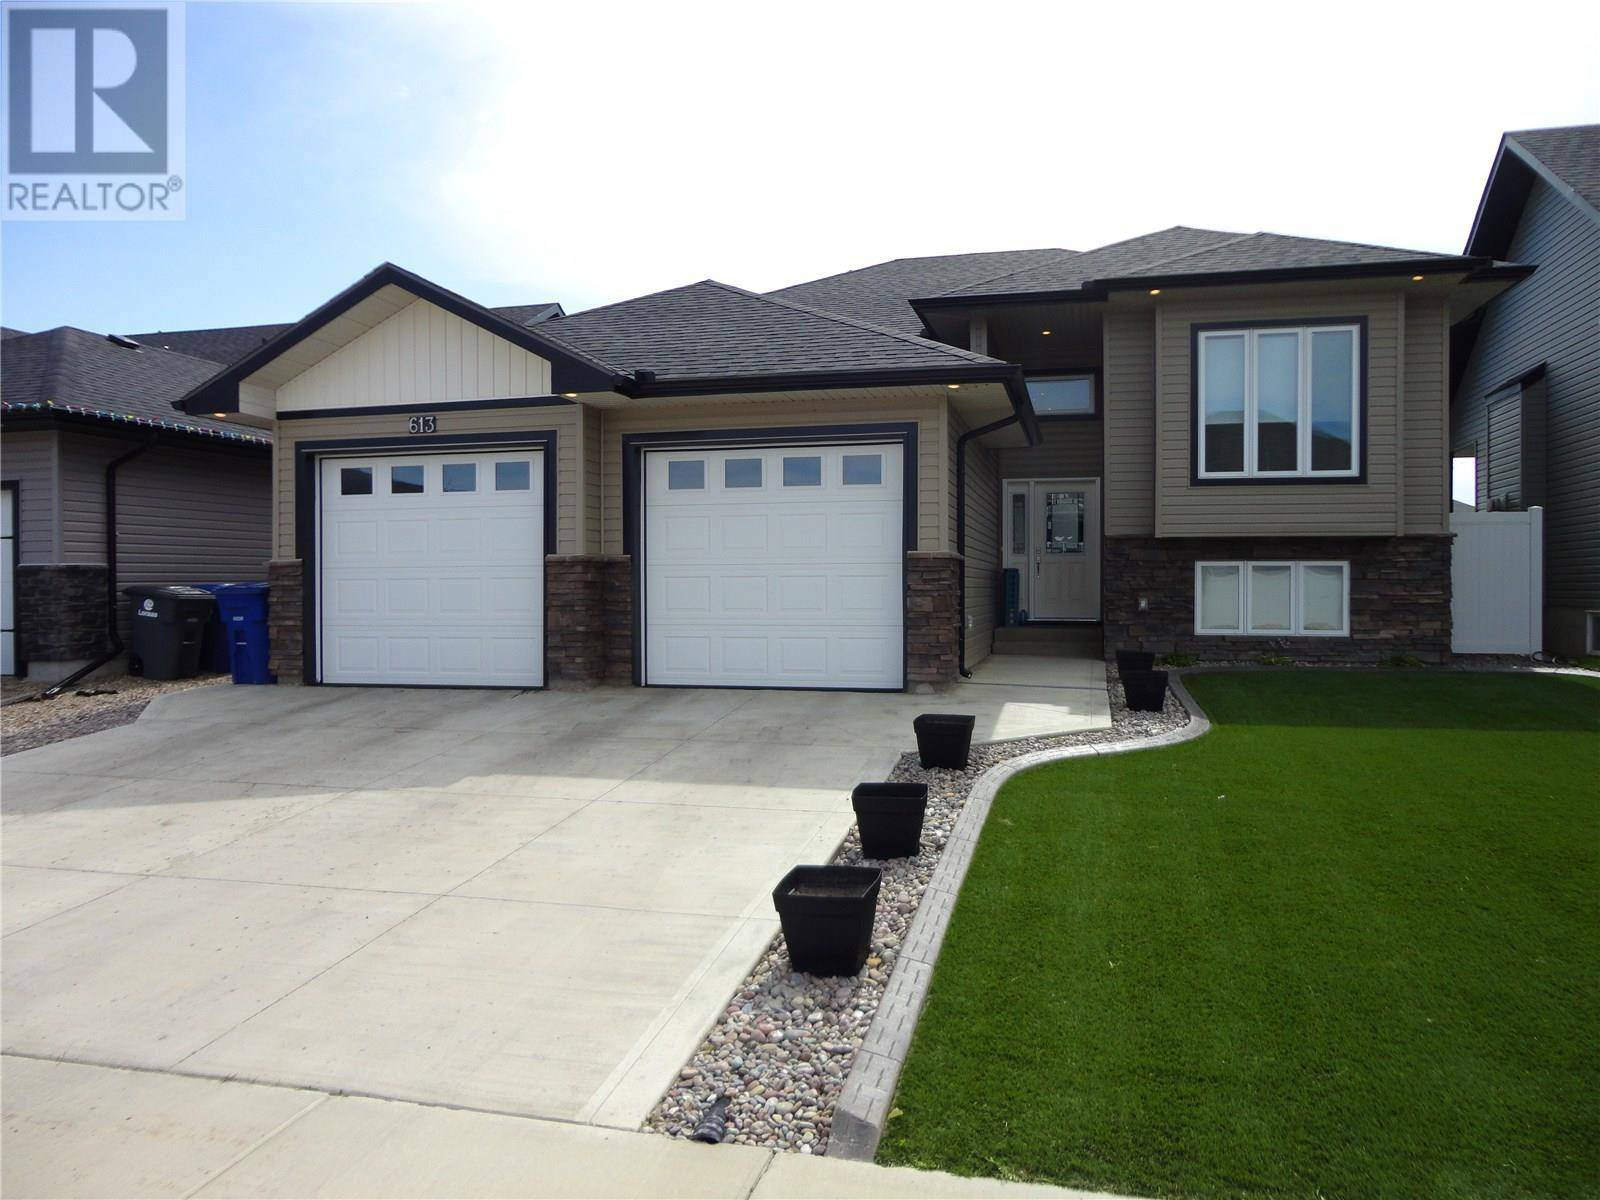 House for sale at 613 Maple Cres Warman Saskatchewan - MLS: SK783583